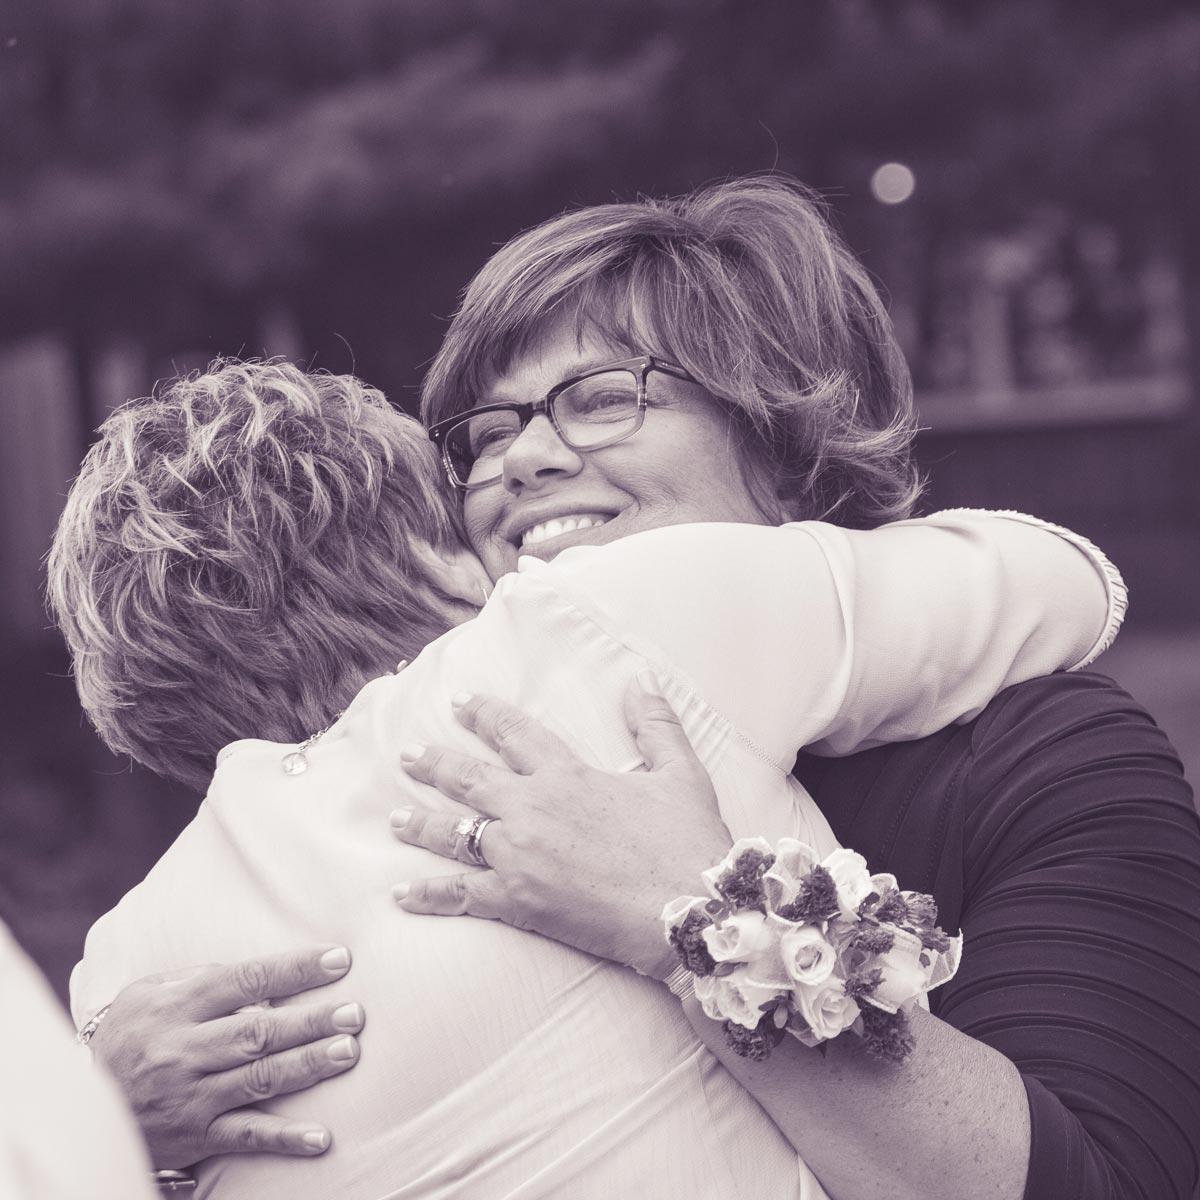 evansville-wedding-photographer-pabst-photo-kokies-echo-valley-(71)